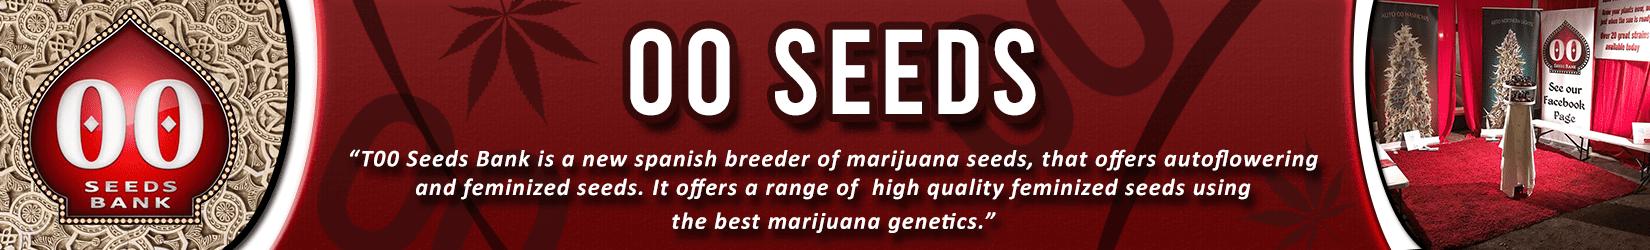 Cannabis Seeds Breeder - 00 Seeds